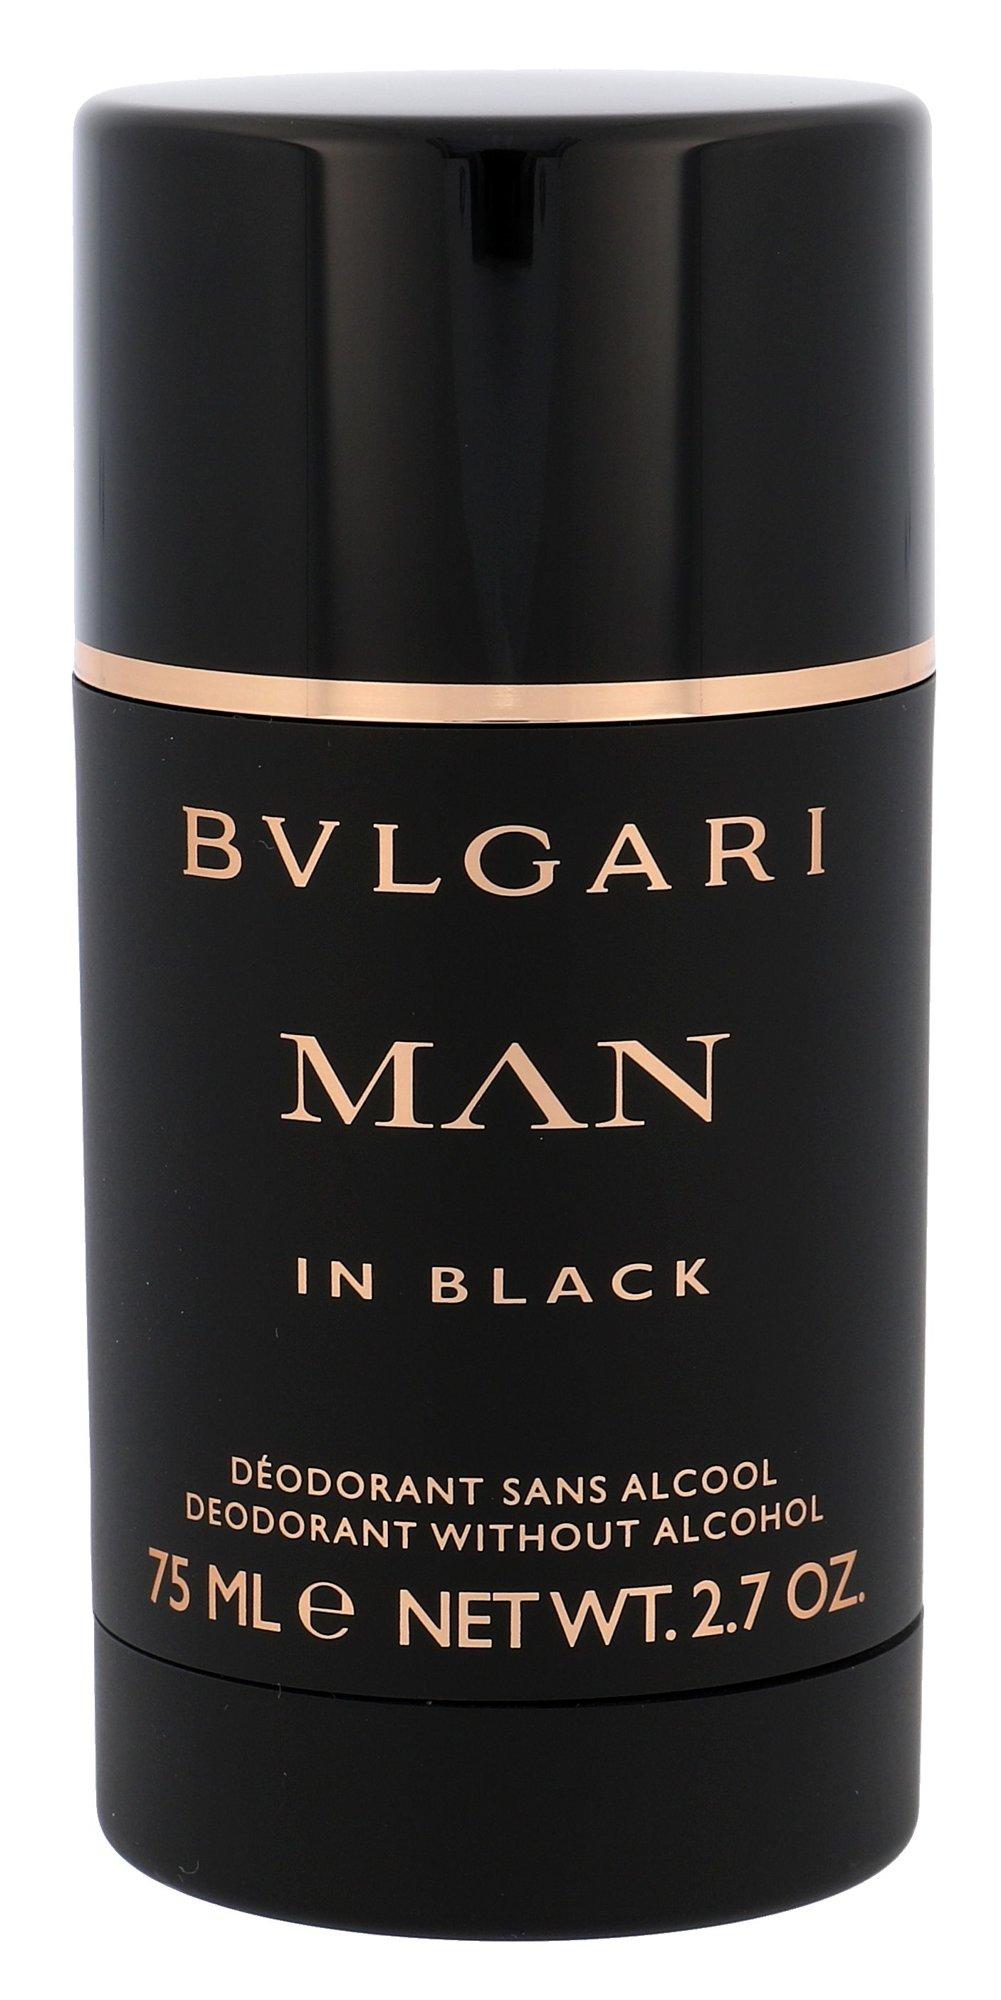 Bvlgari Man In Black Deostick 75ml